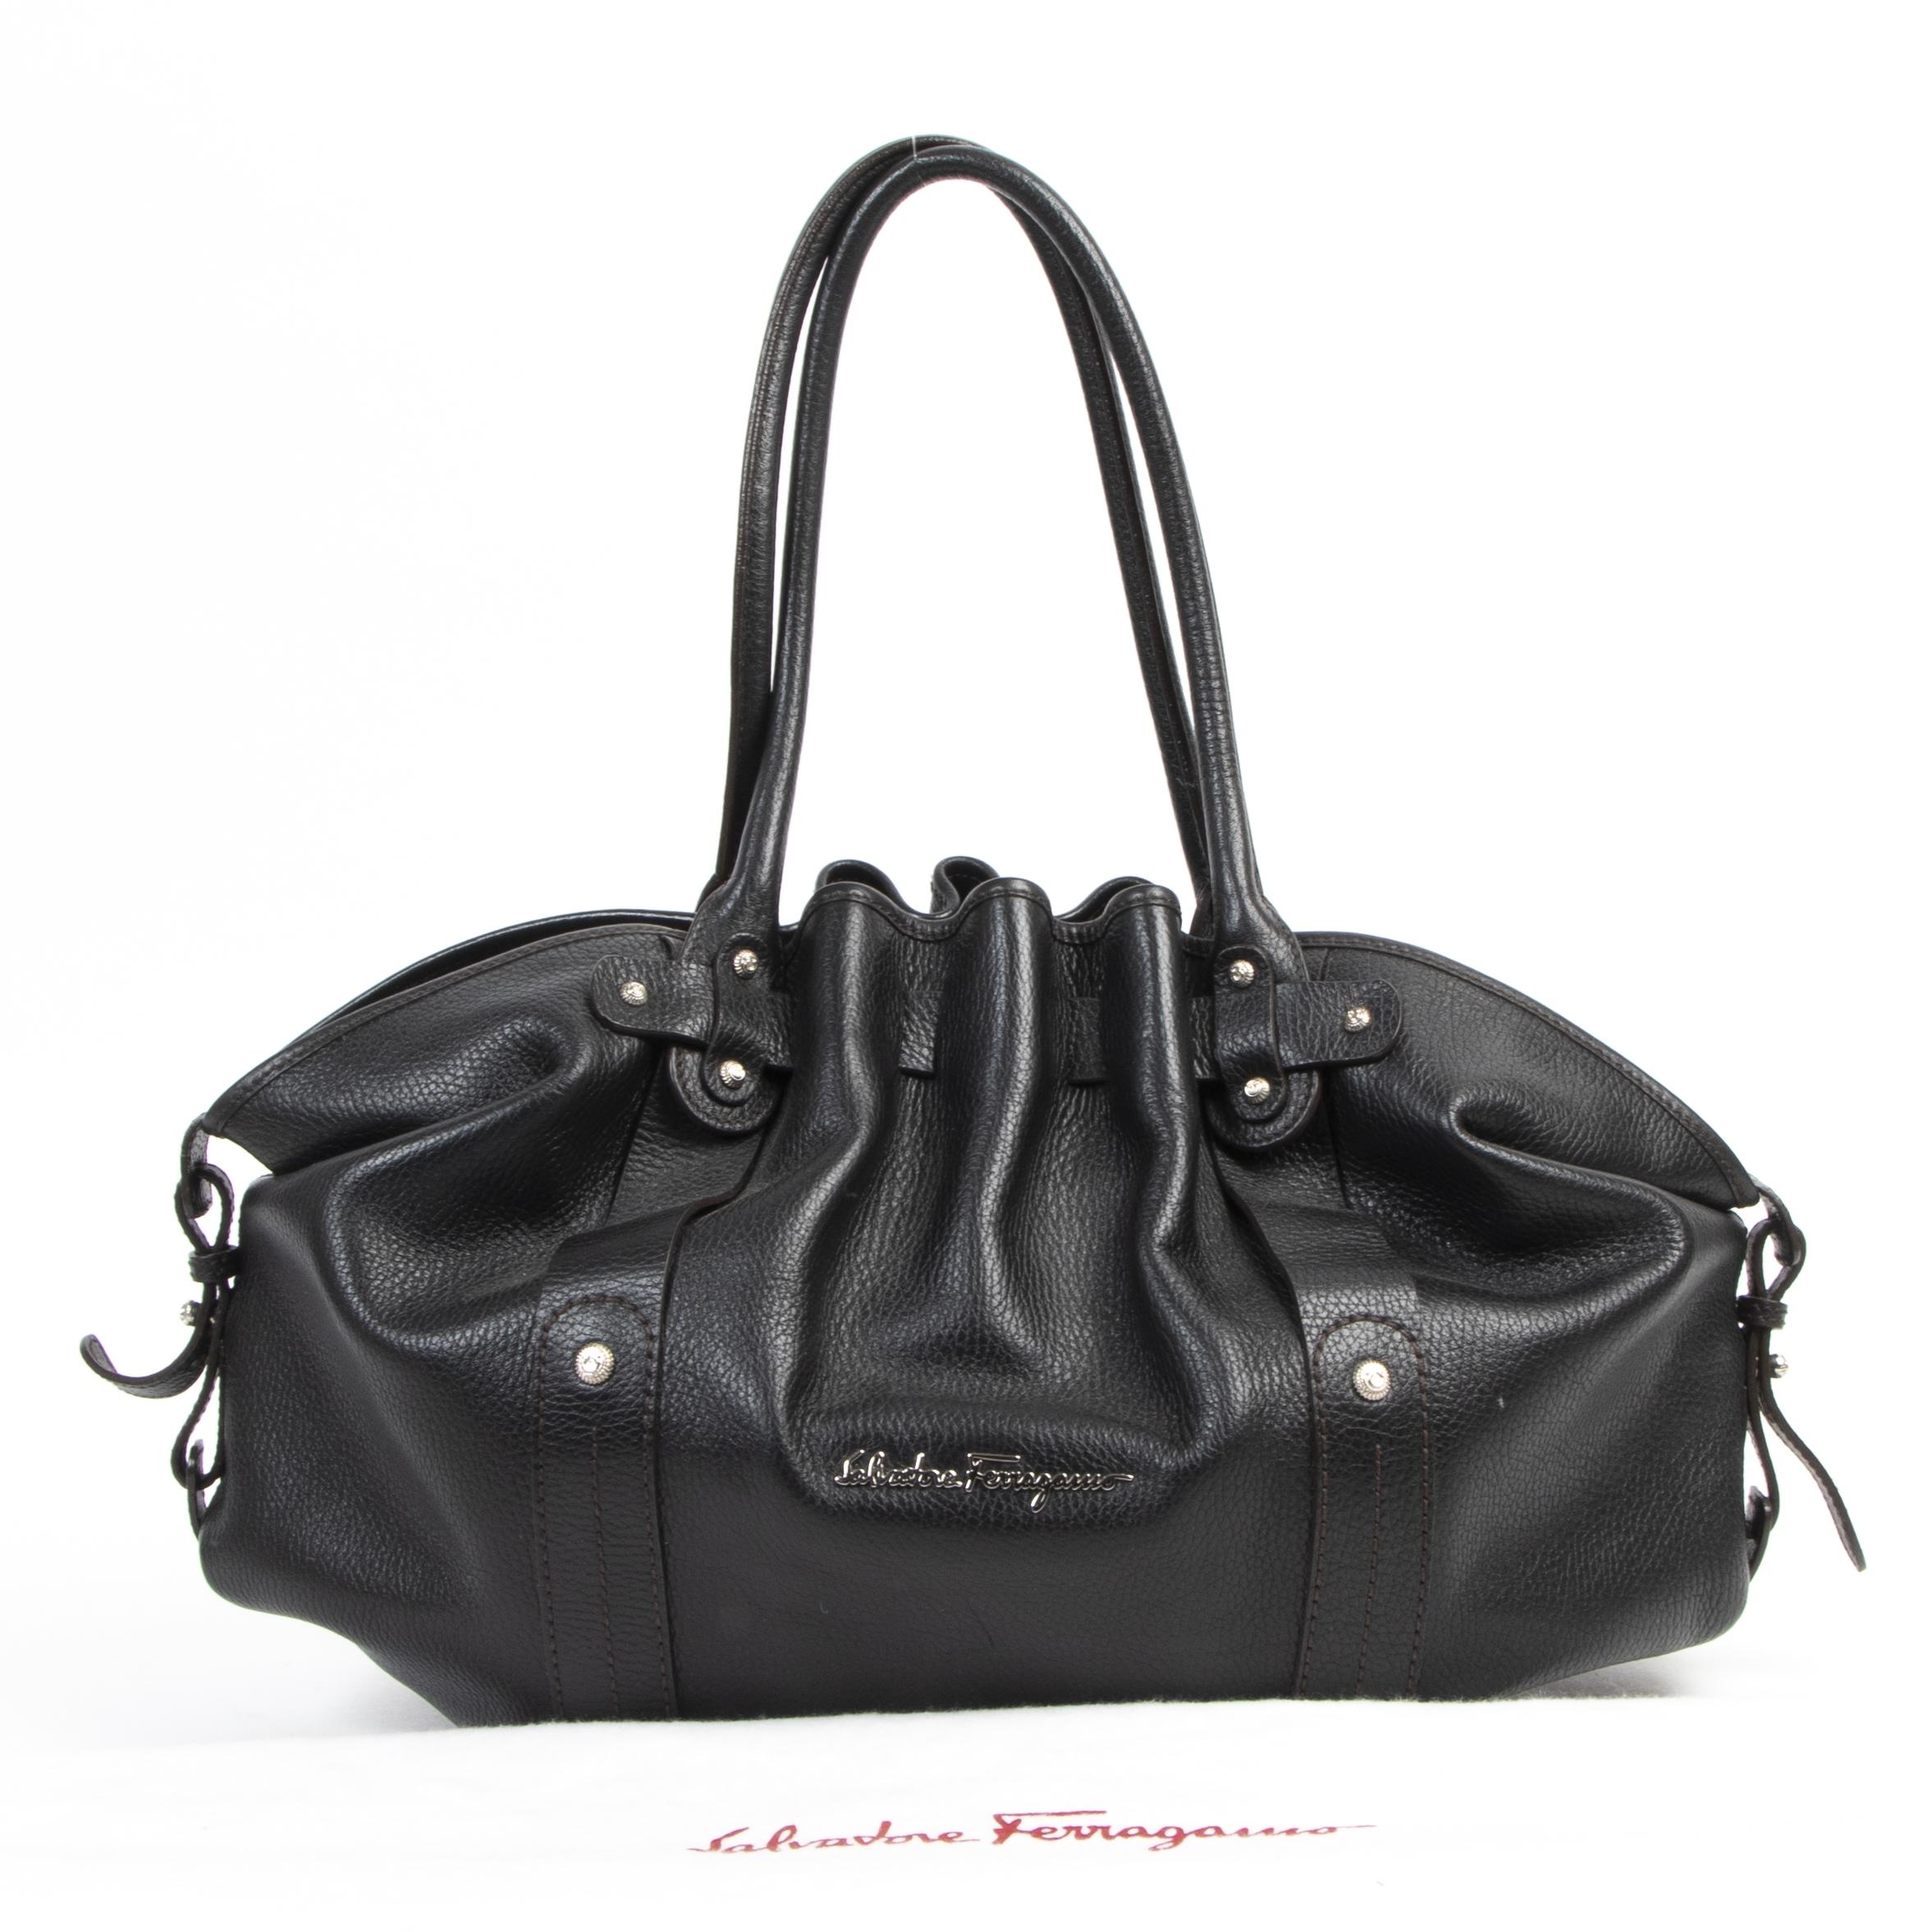 Salvatore Ferragamo Black Shoulder Bag te koop bij Labellov